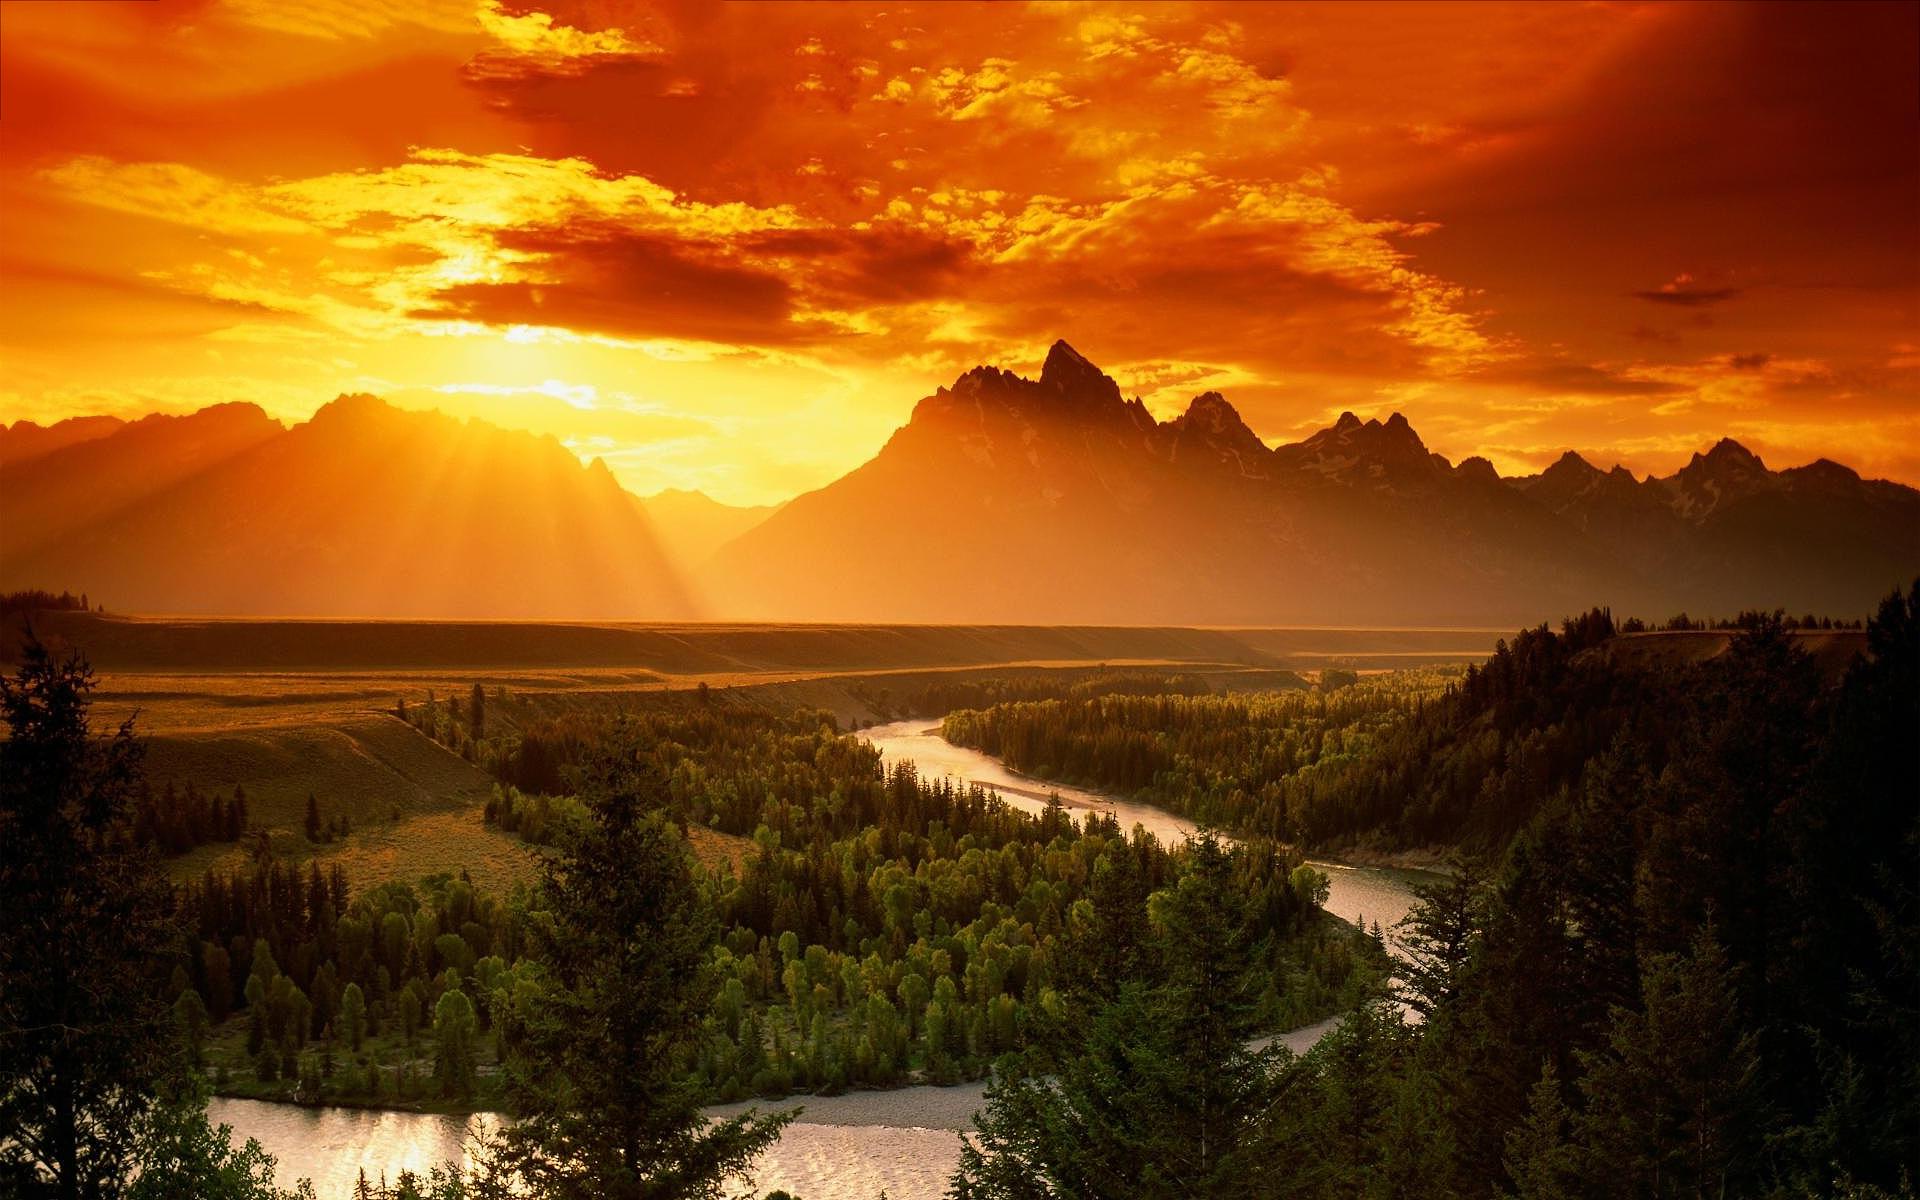 Sunset Wallpapers Landscape - HD Desktop Wallpapers